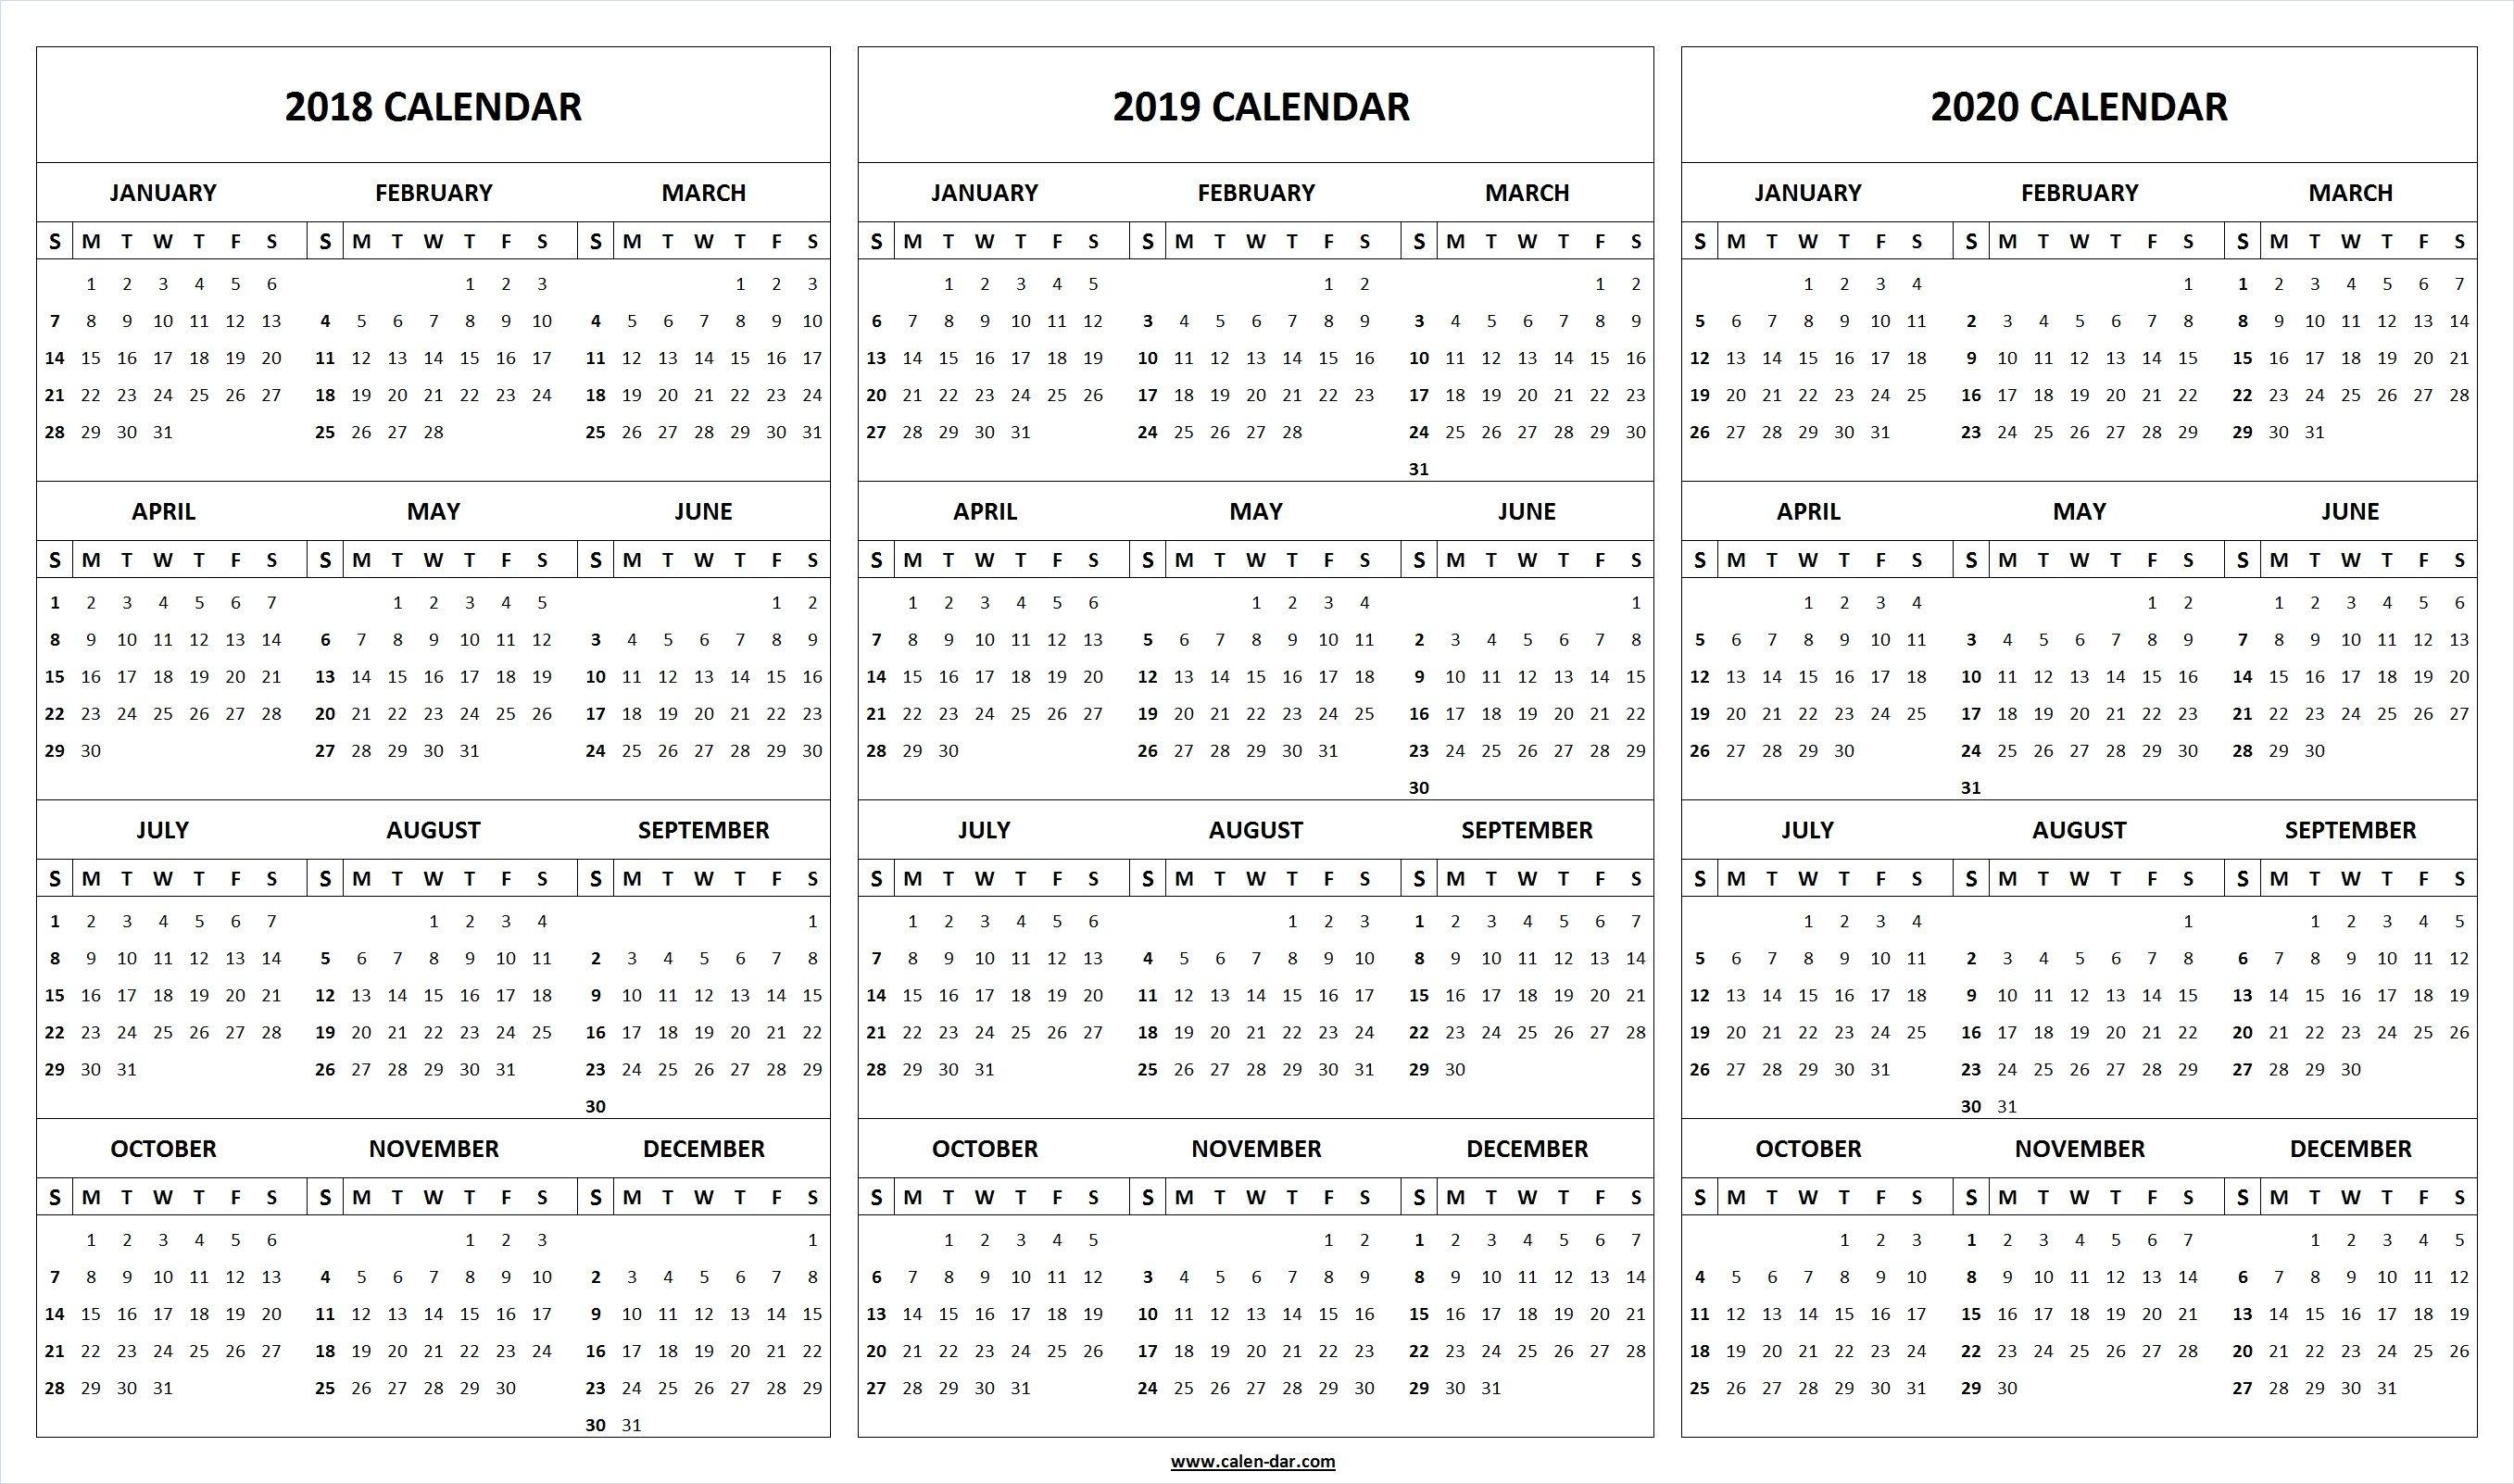 Print Blank 2018 2019 2020 Calendar Template | Organize! | Printable inside Calendar 2019 2020 With Boxes